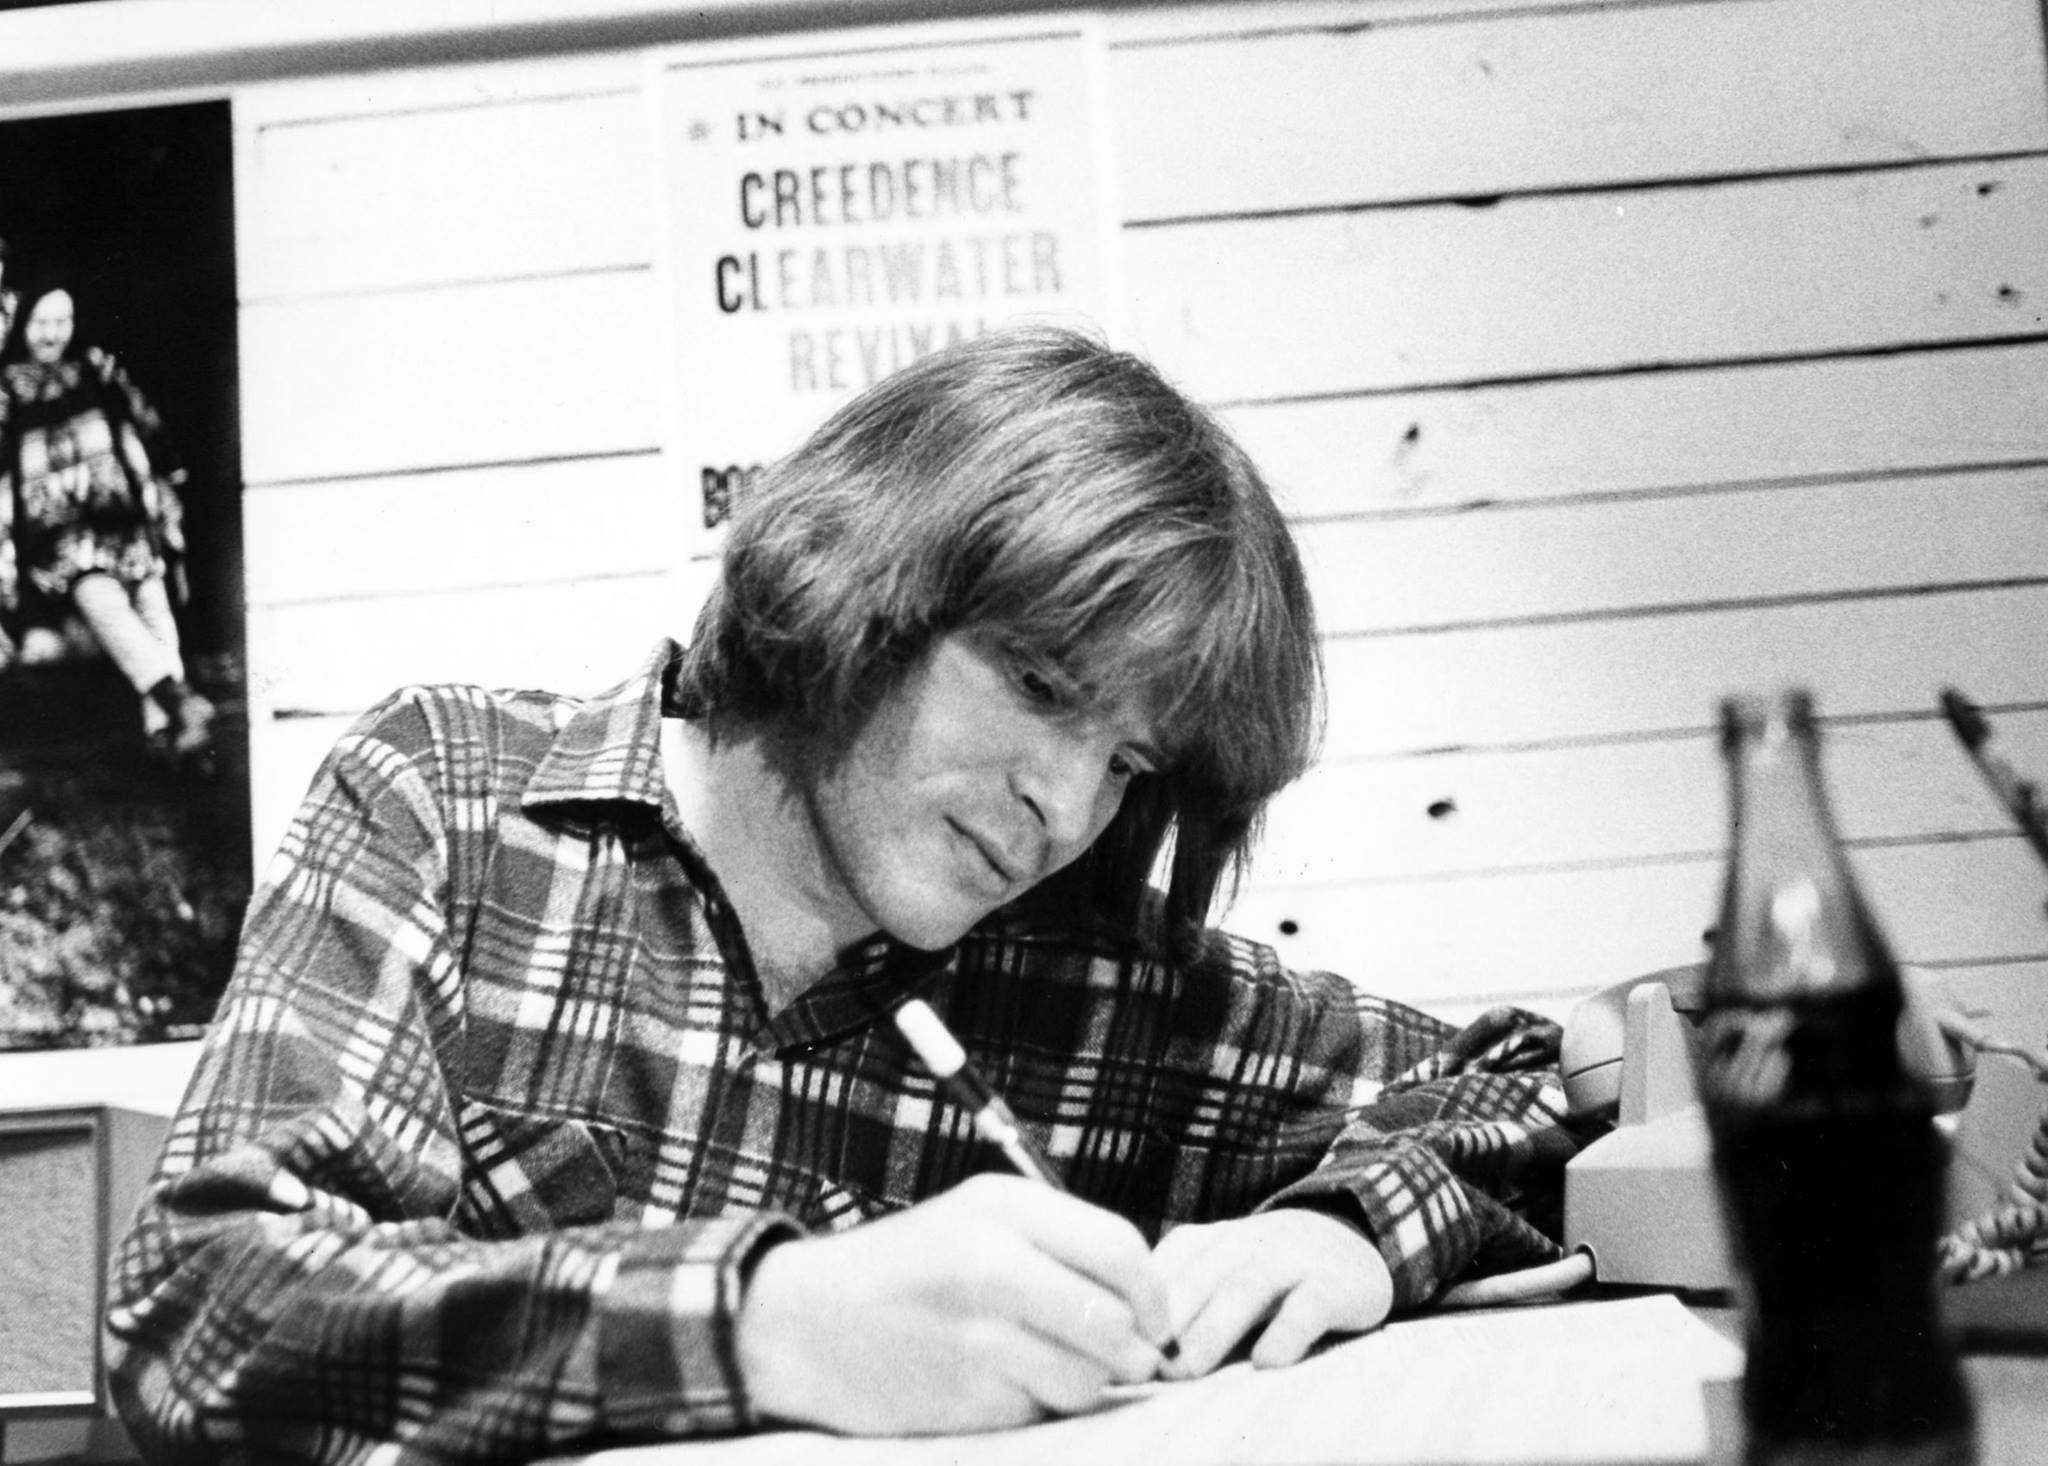 Fogarty 1970